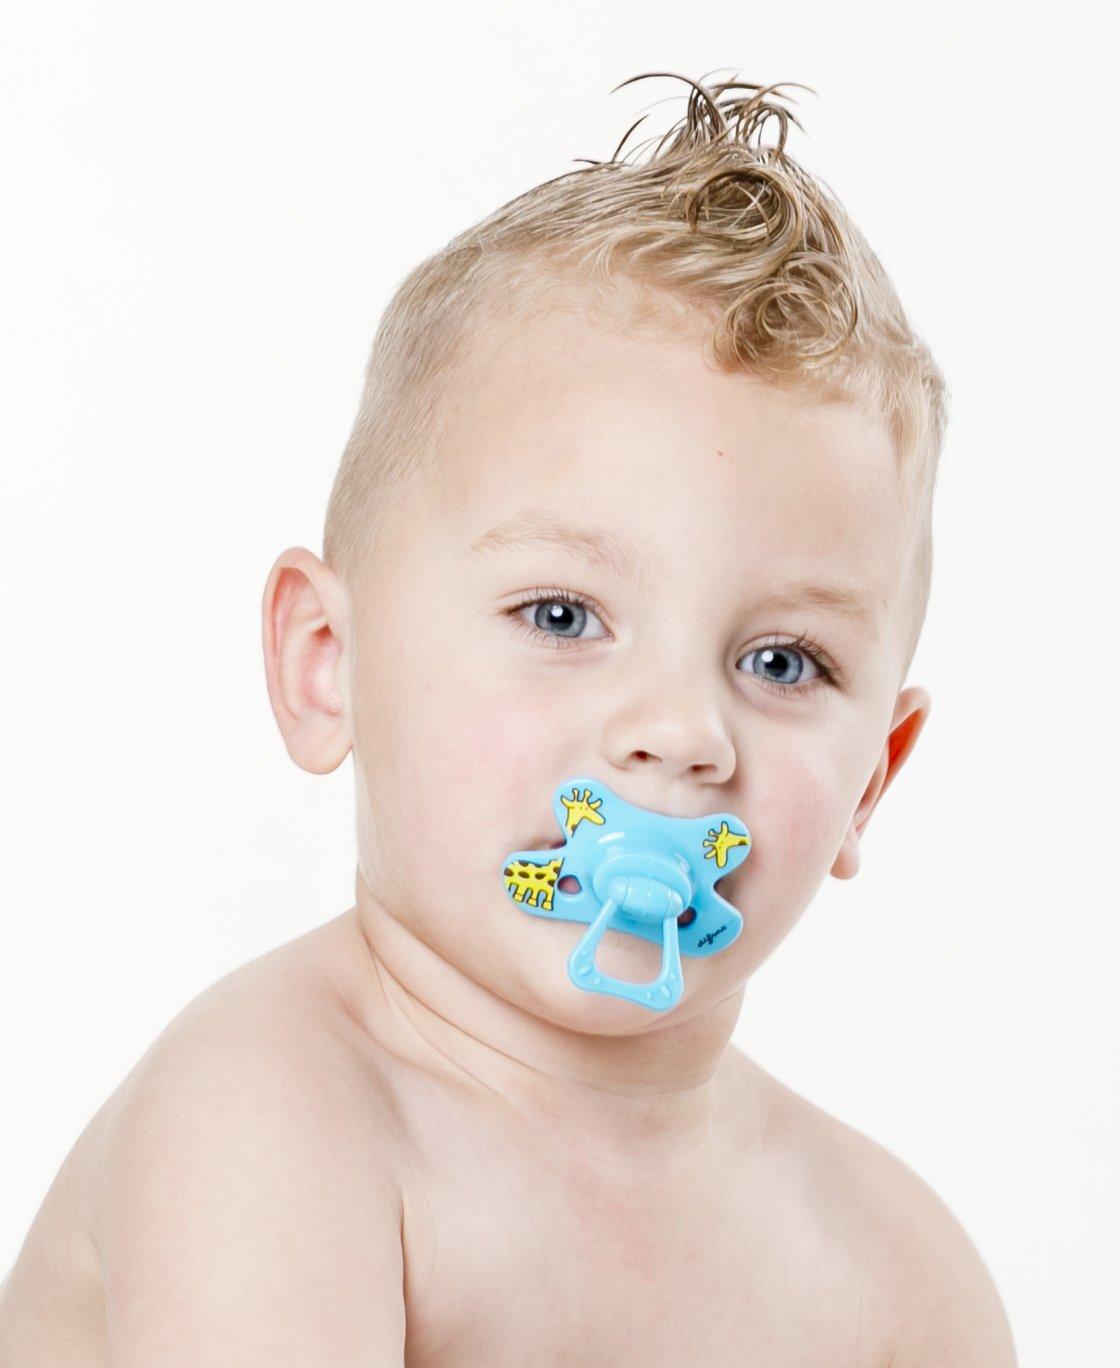 Amazon.com: Difrax Dental Chupete extra fuertes (18 meses ...